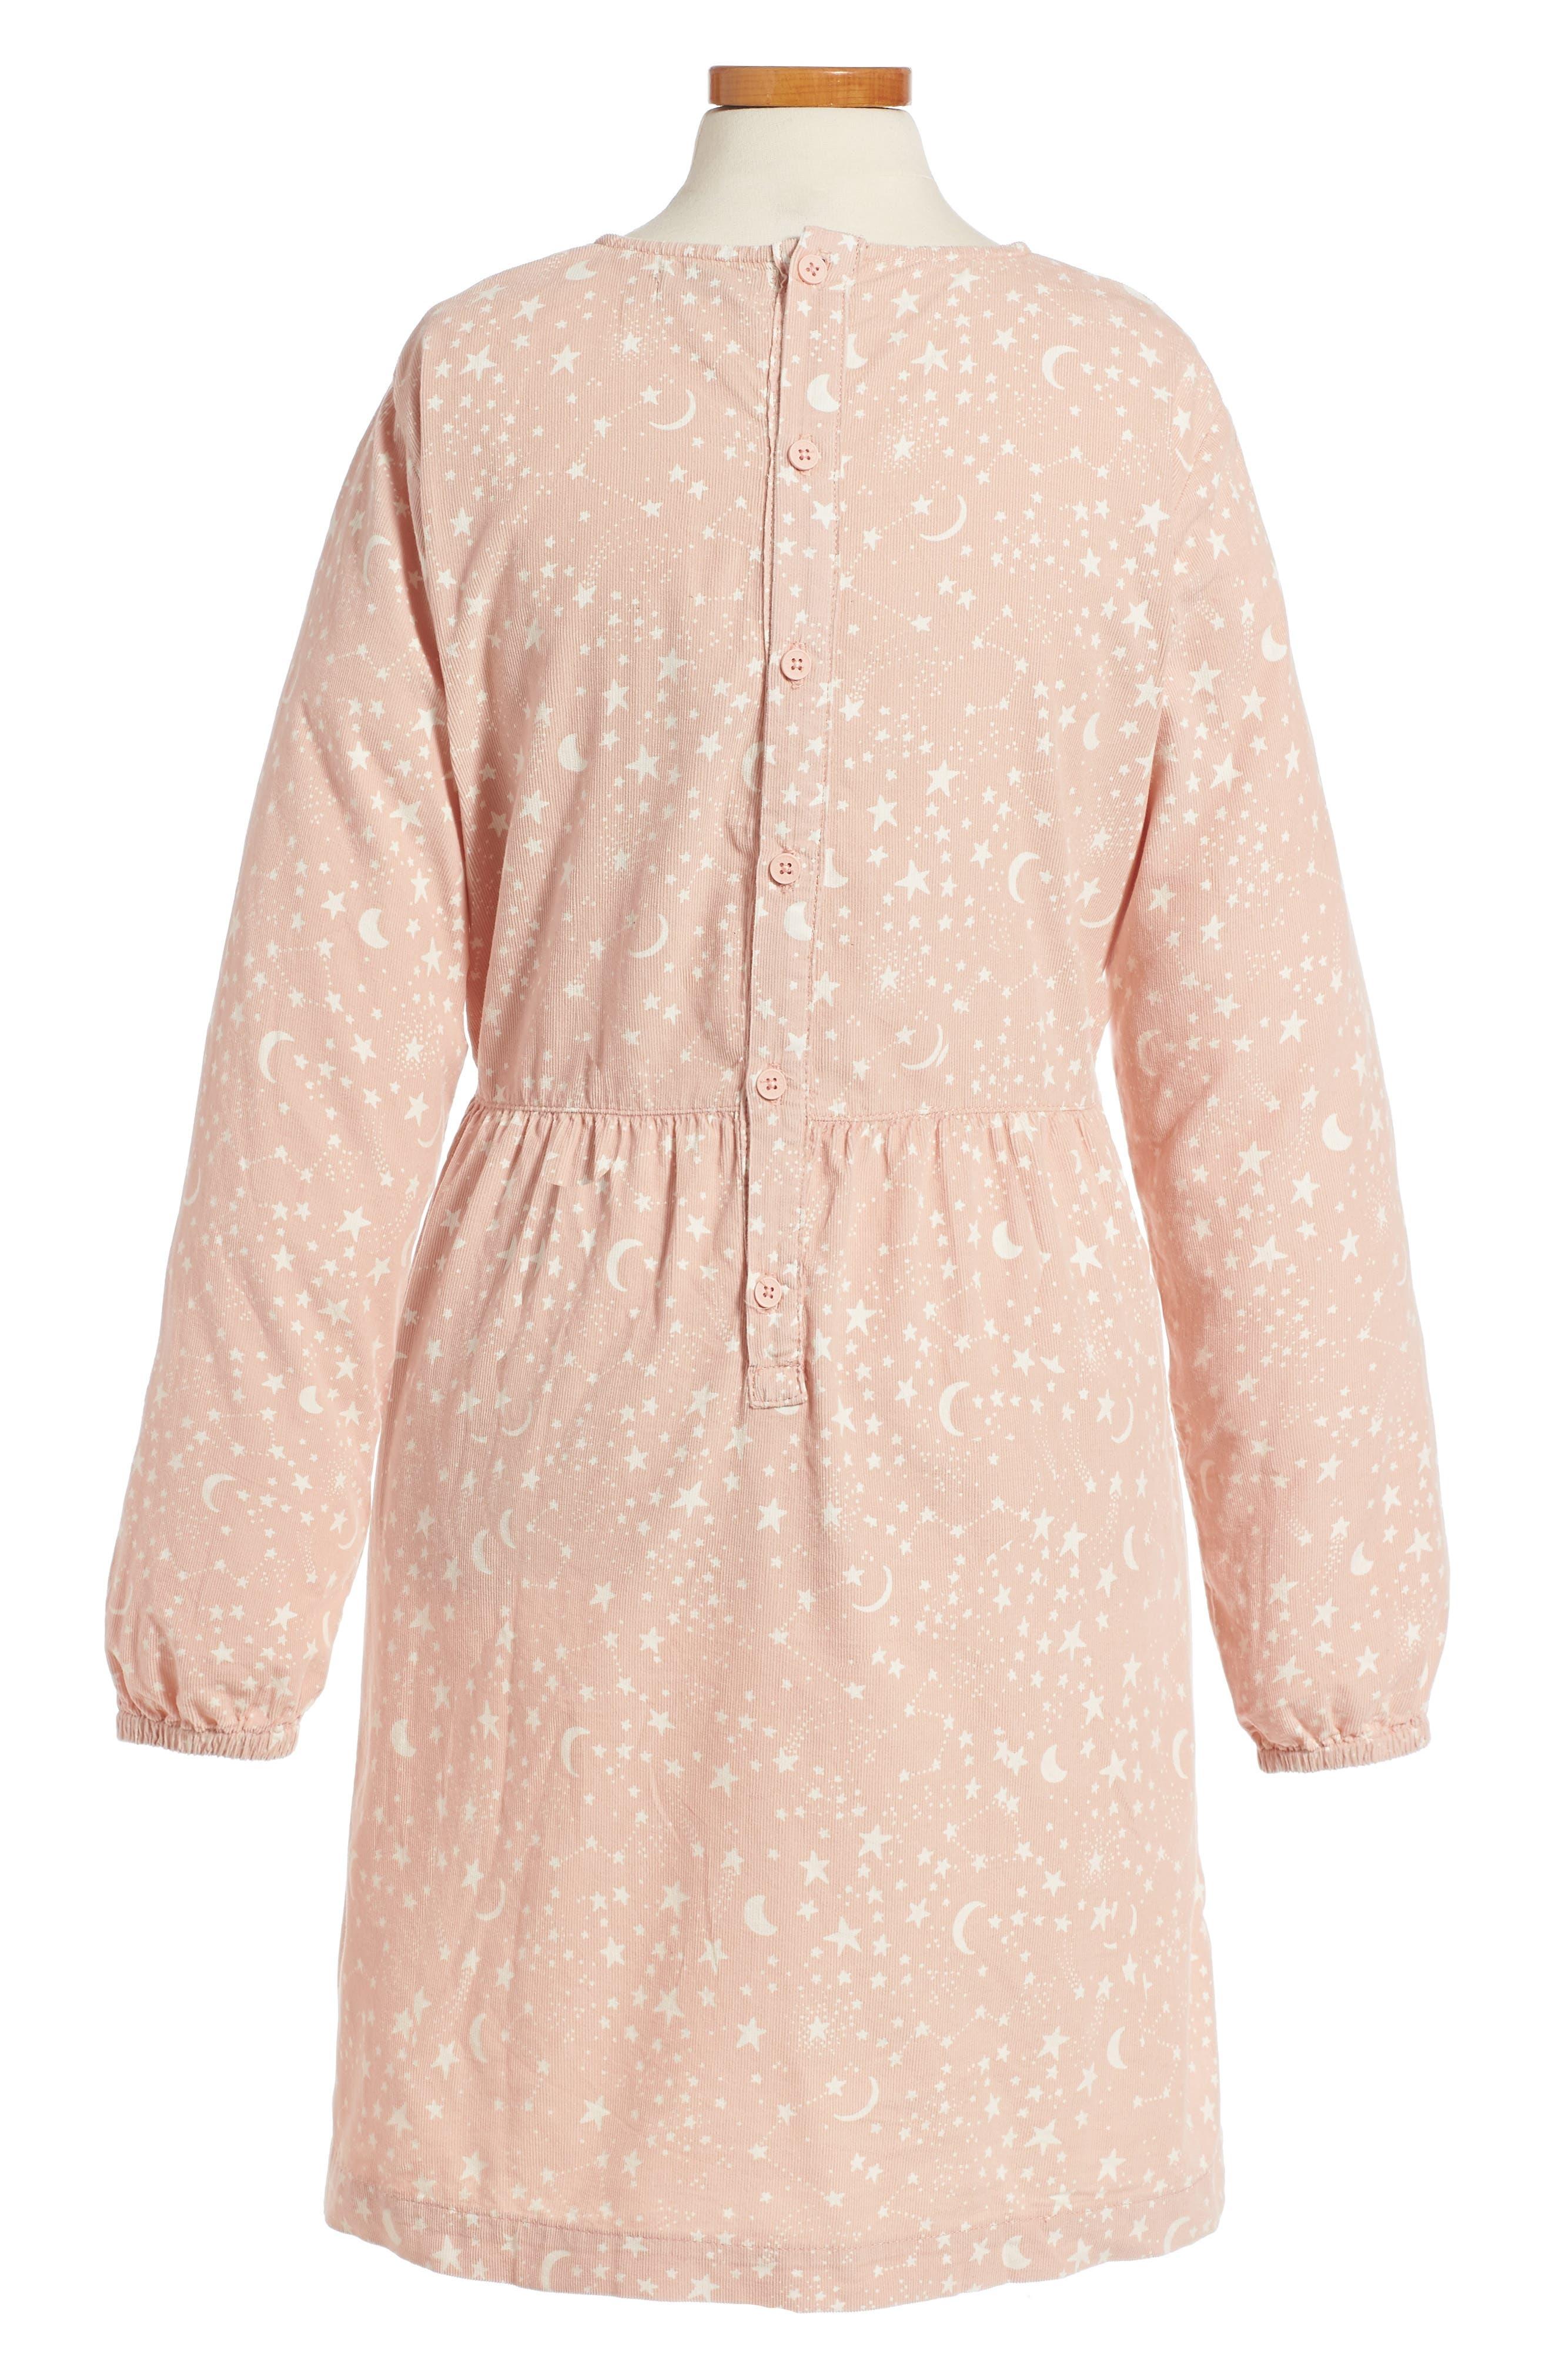 Kids Skippy Star Print Dress,                             Alternate thumbnail 2, color,                             650